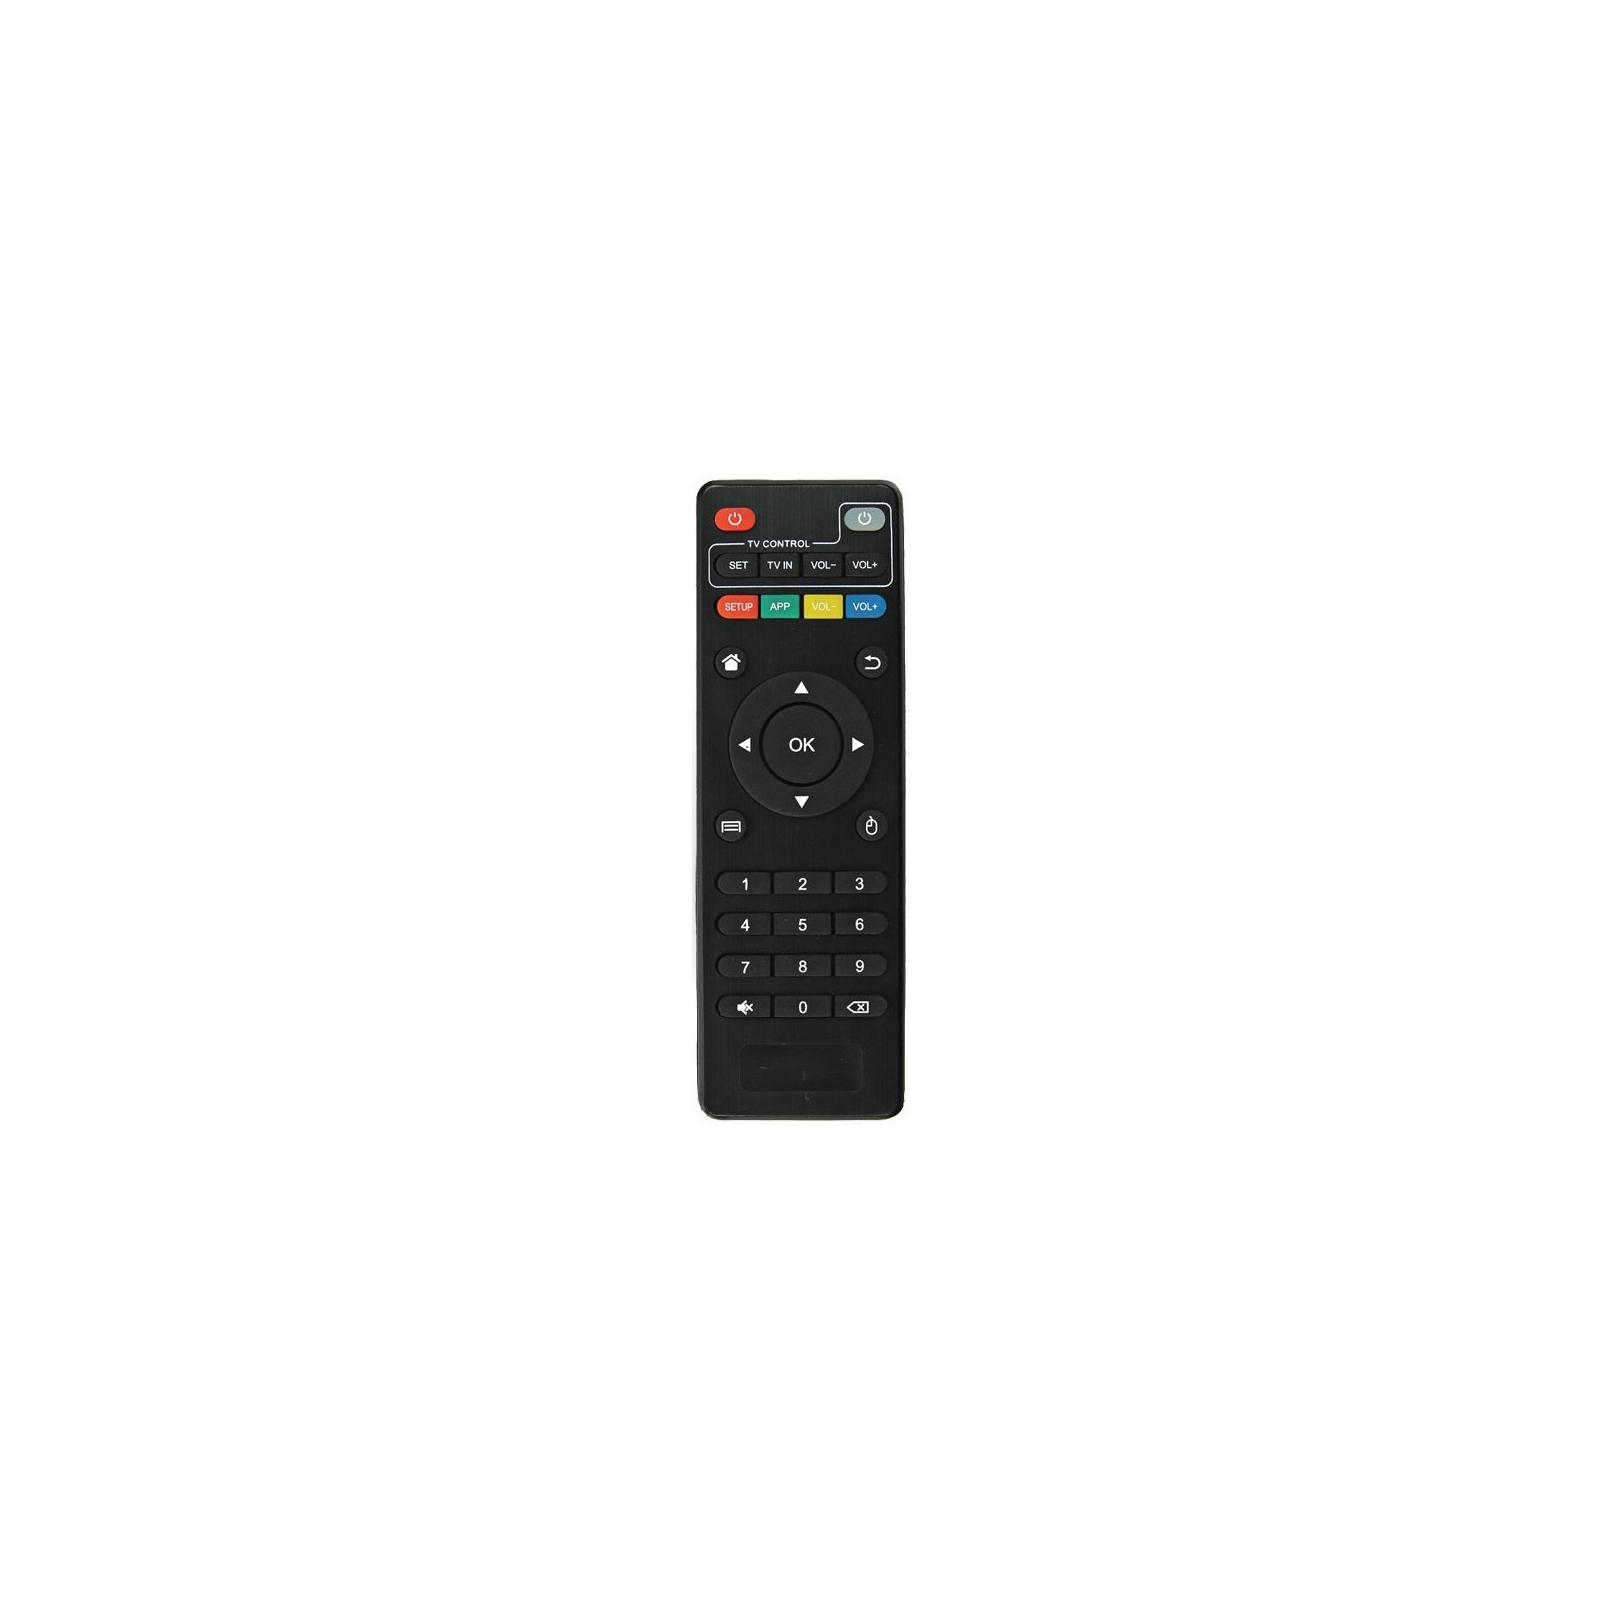 Медиаплеер Alfacore Smart TV MXQ изображение 6